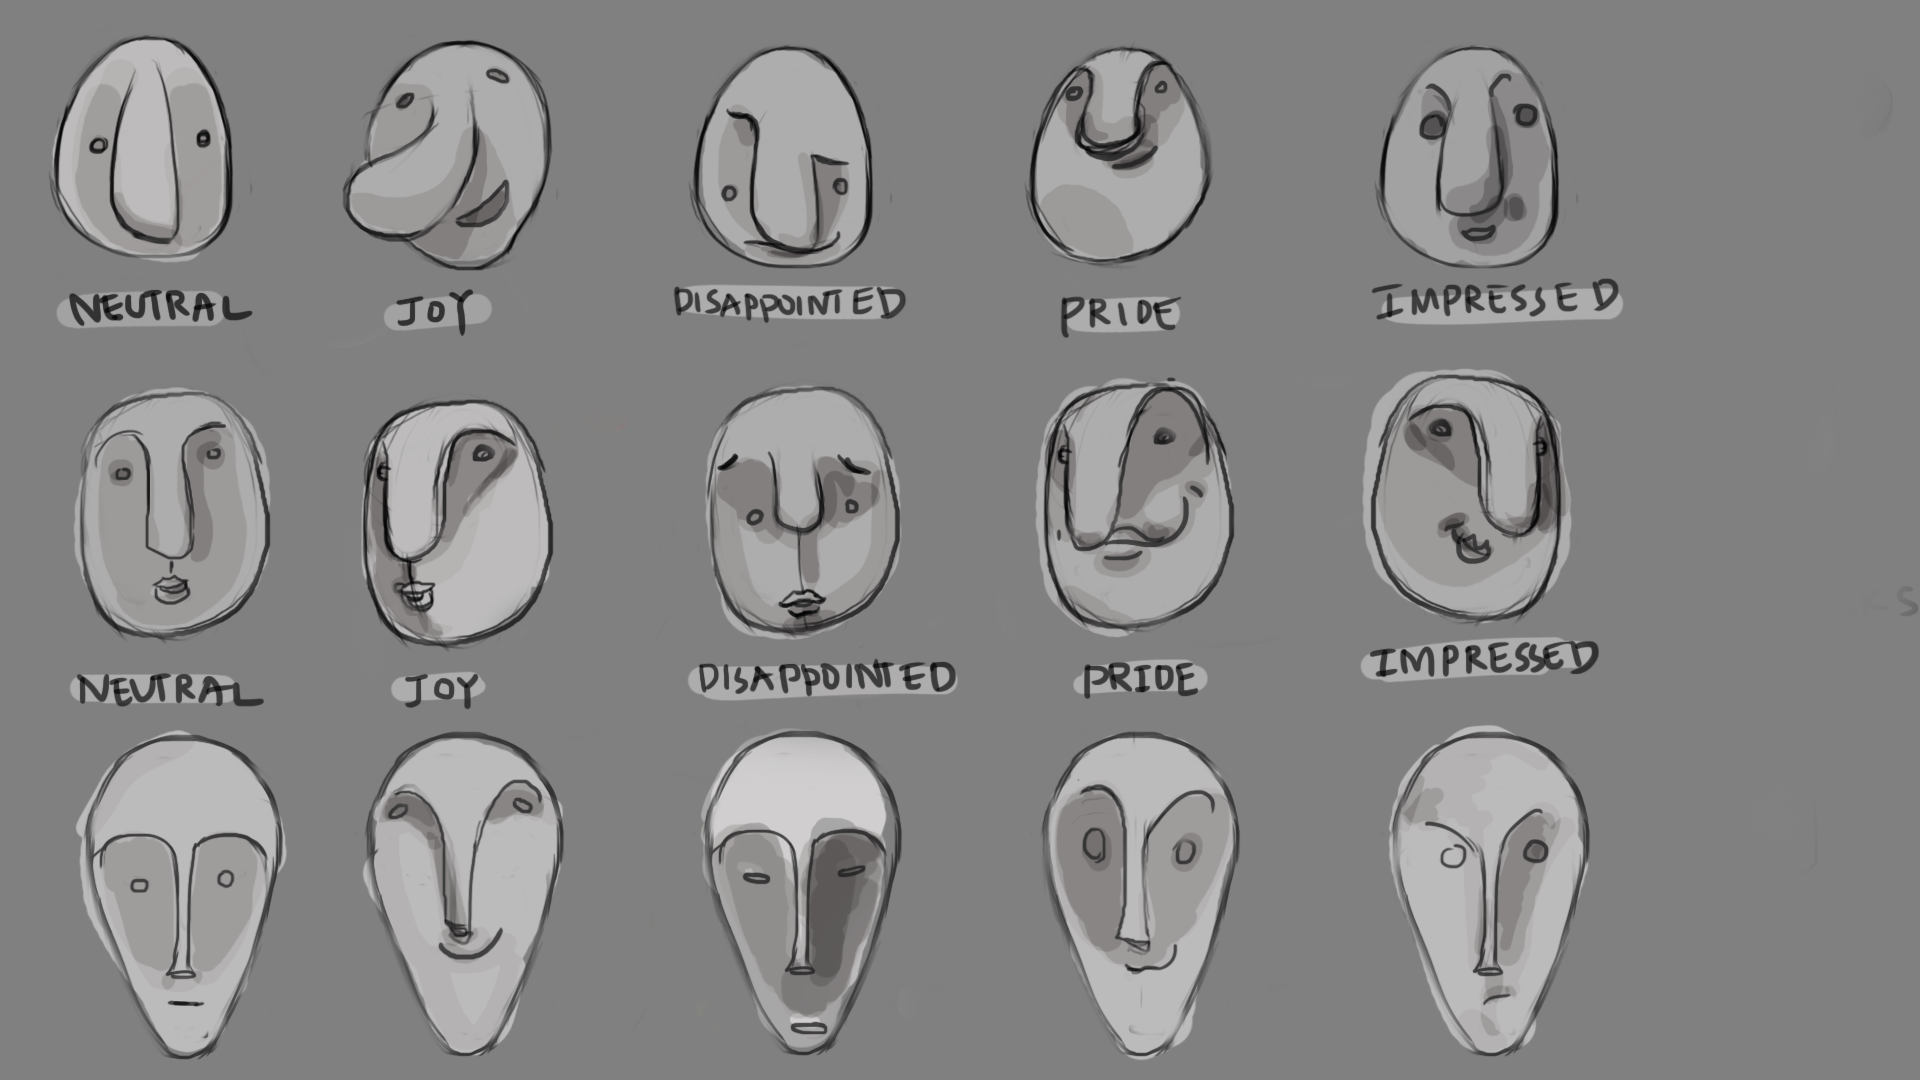 Emotion studies